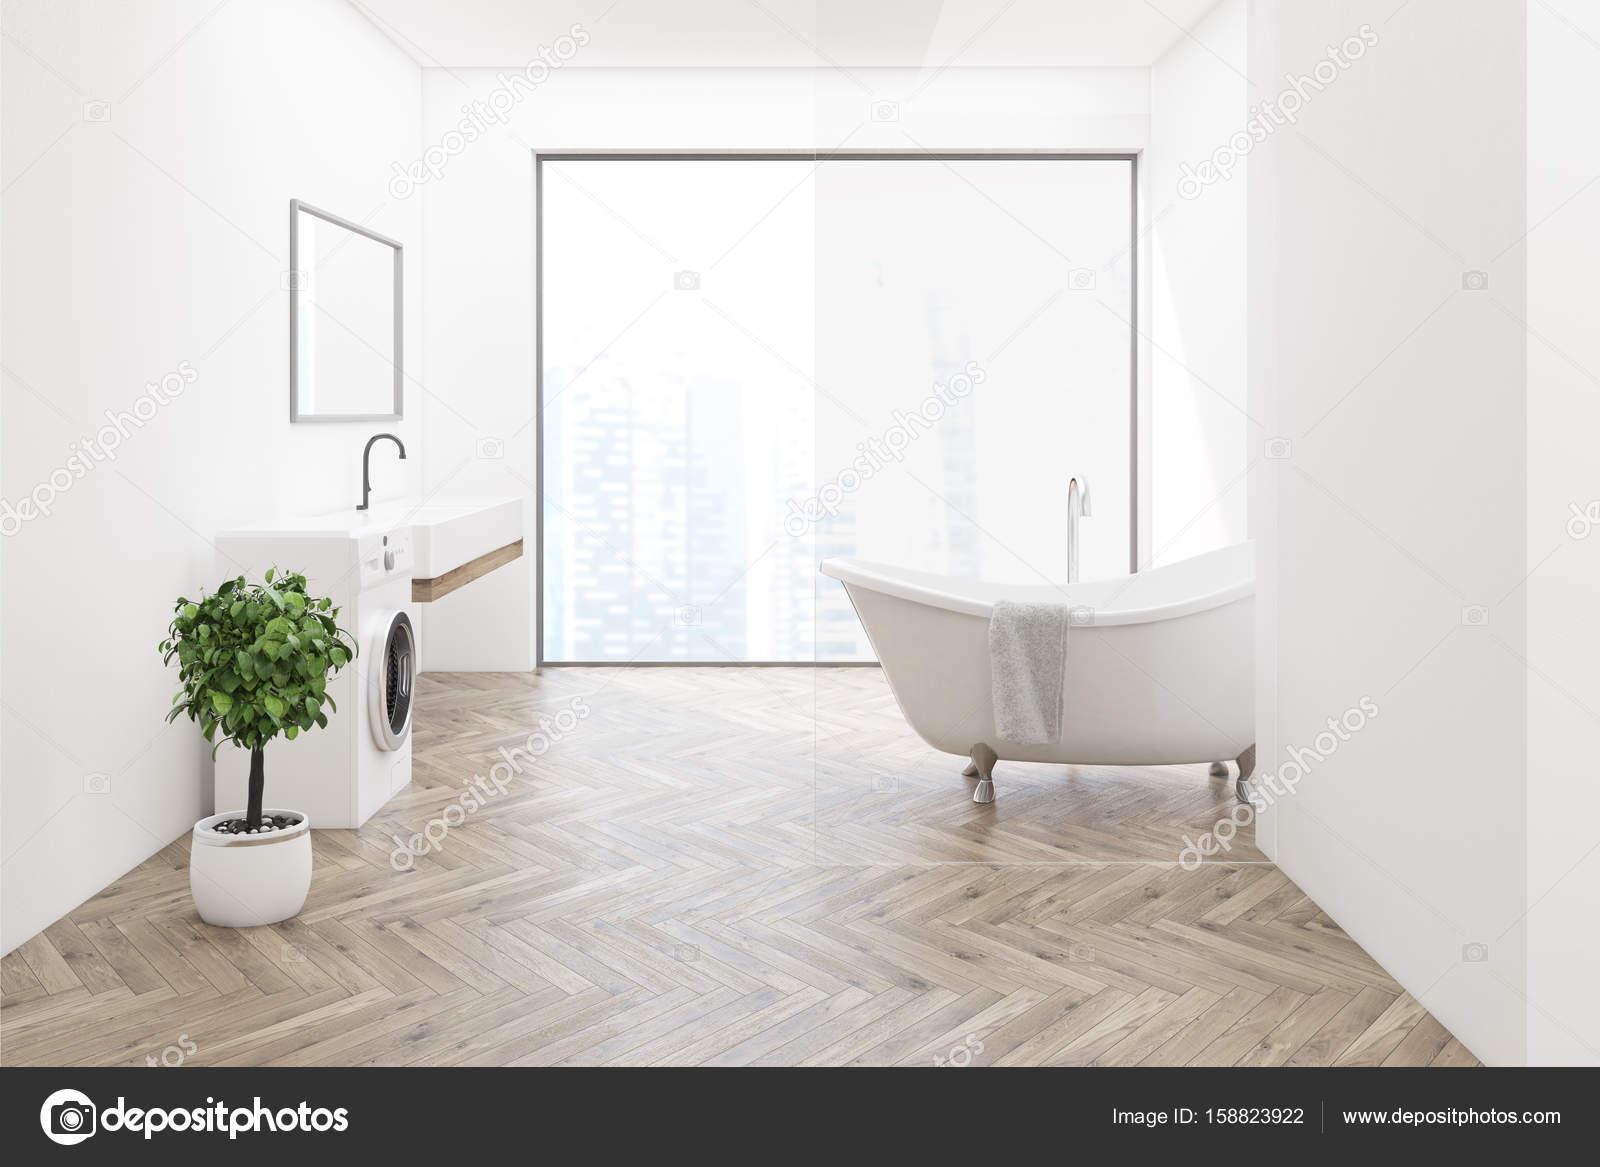 Houten vloer badkamer wasmachine kant u stockfoto